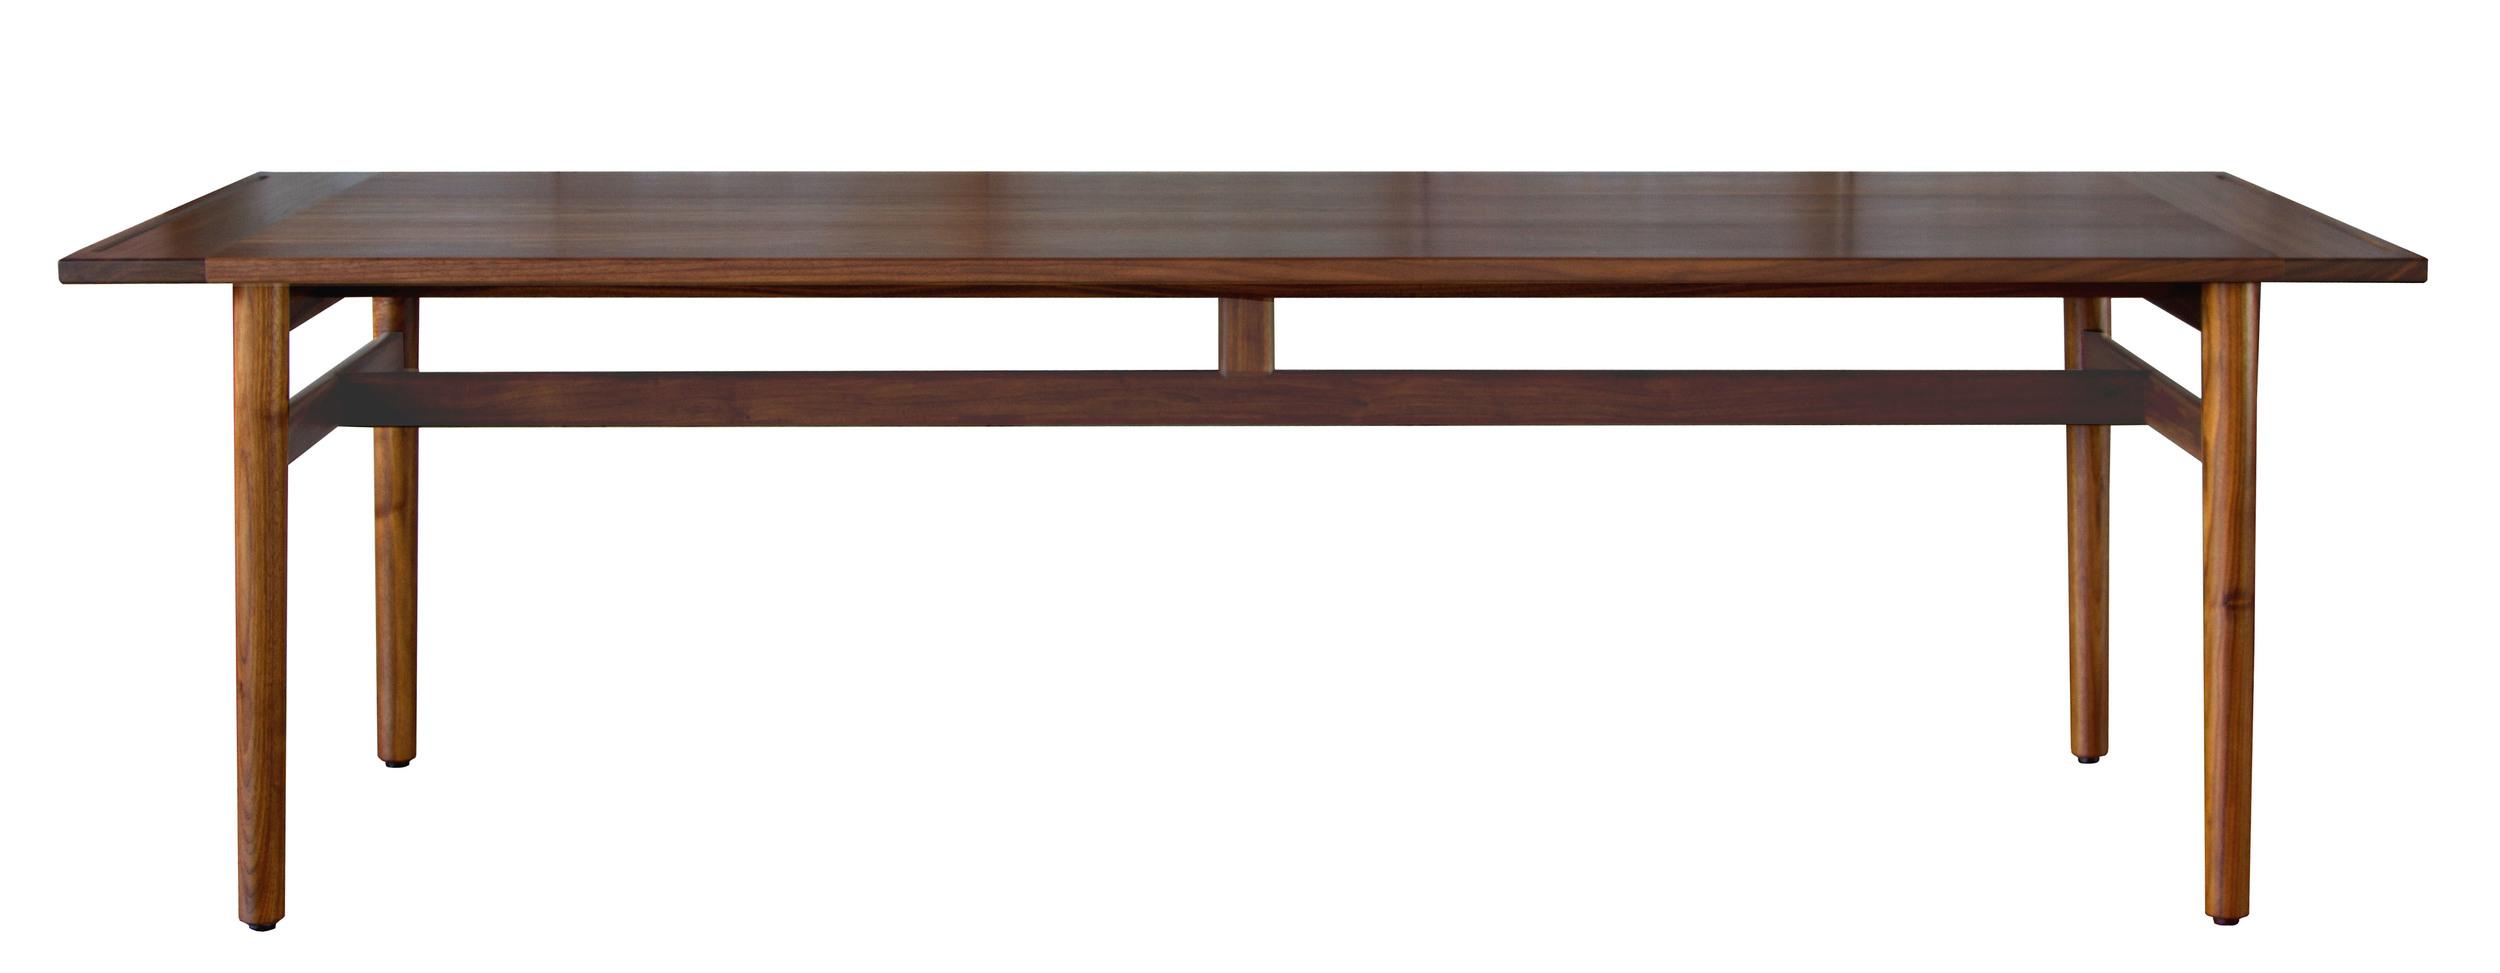 Silbrook Table